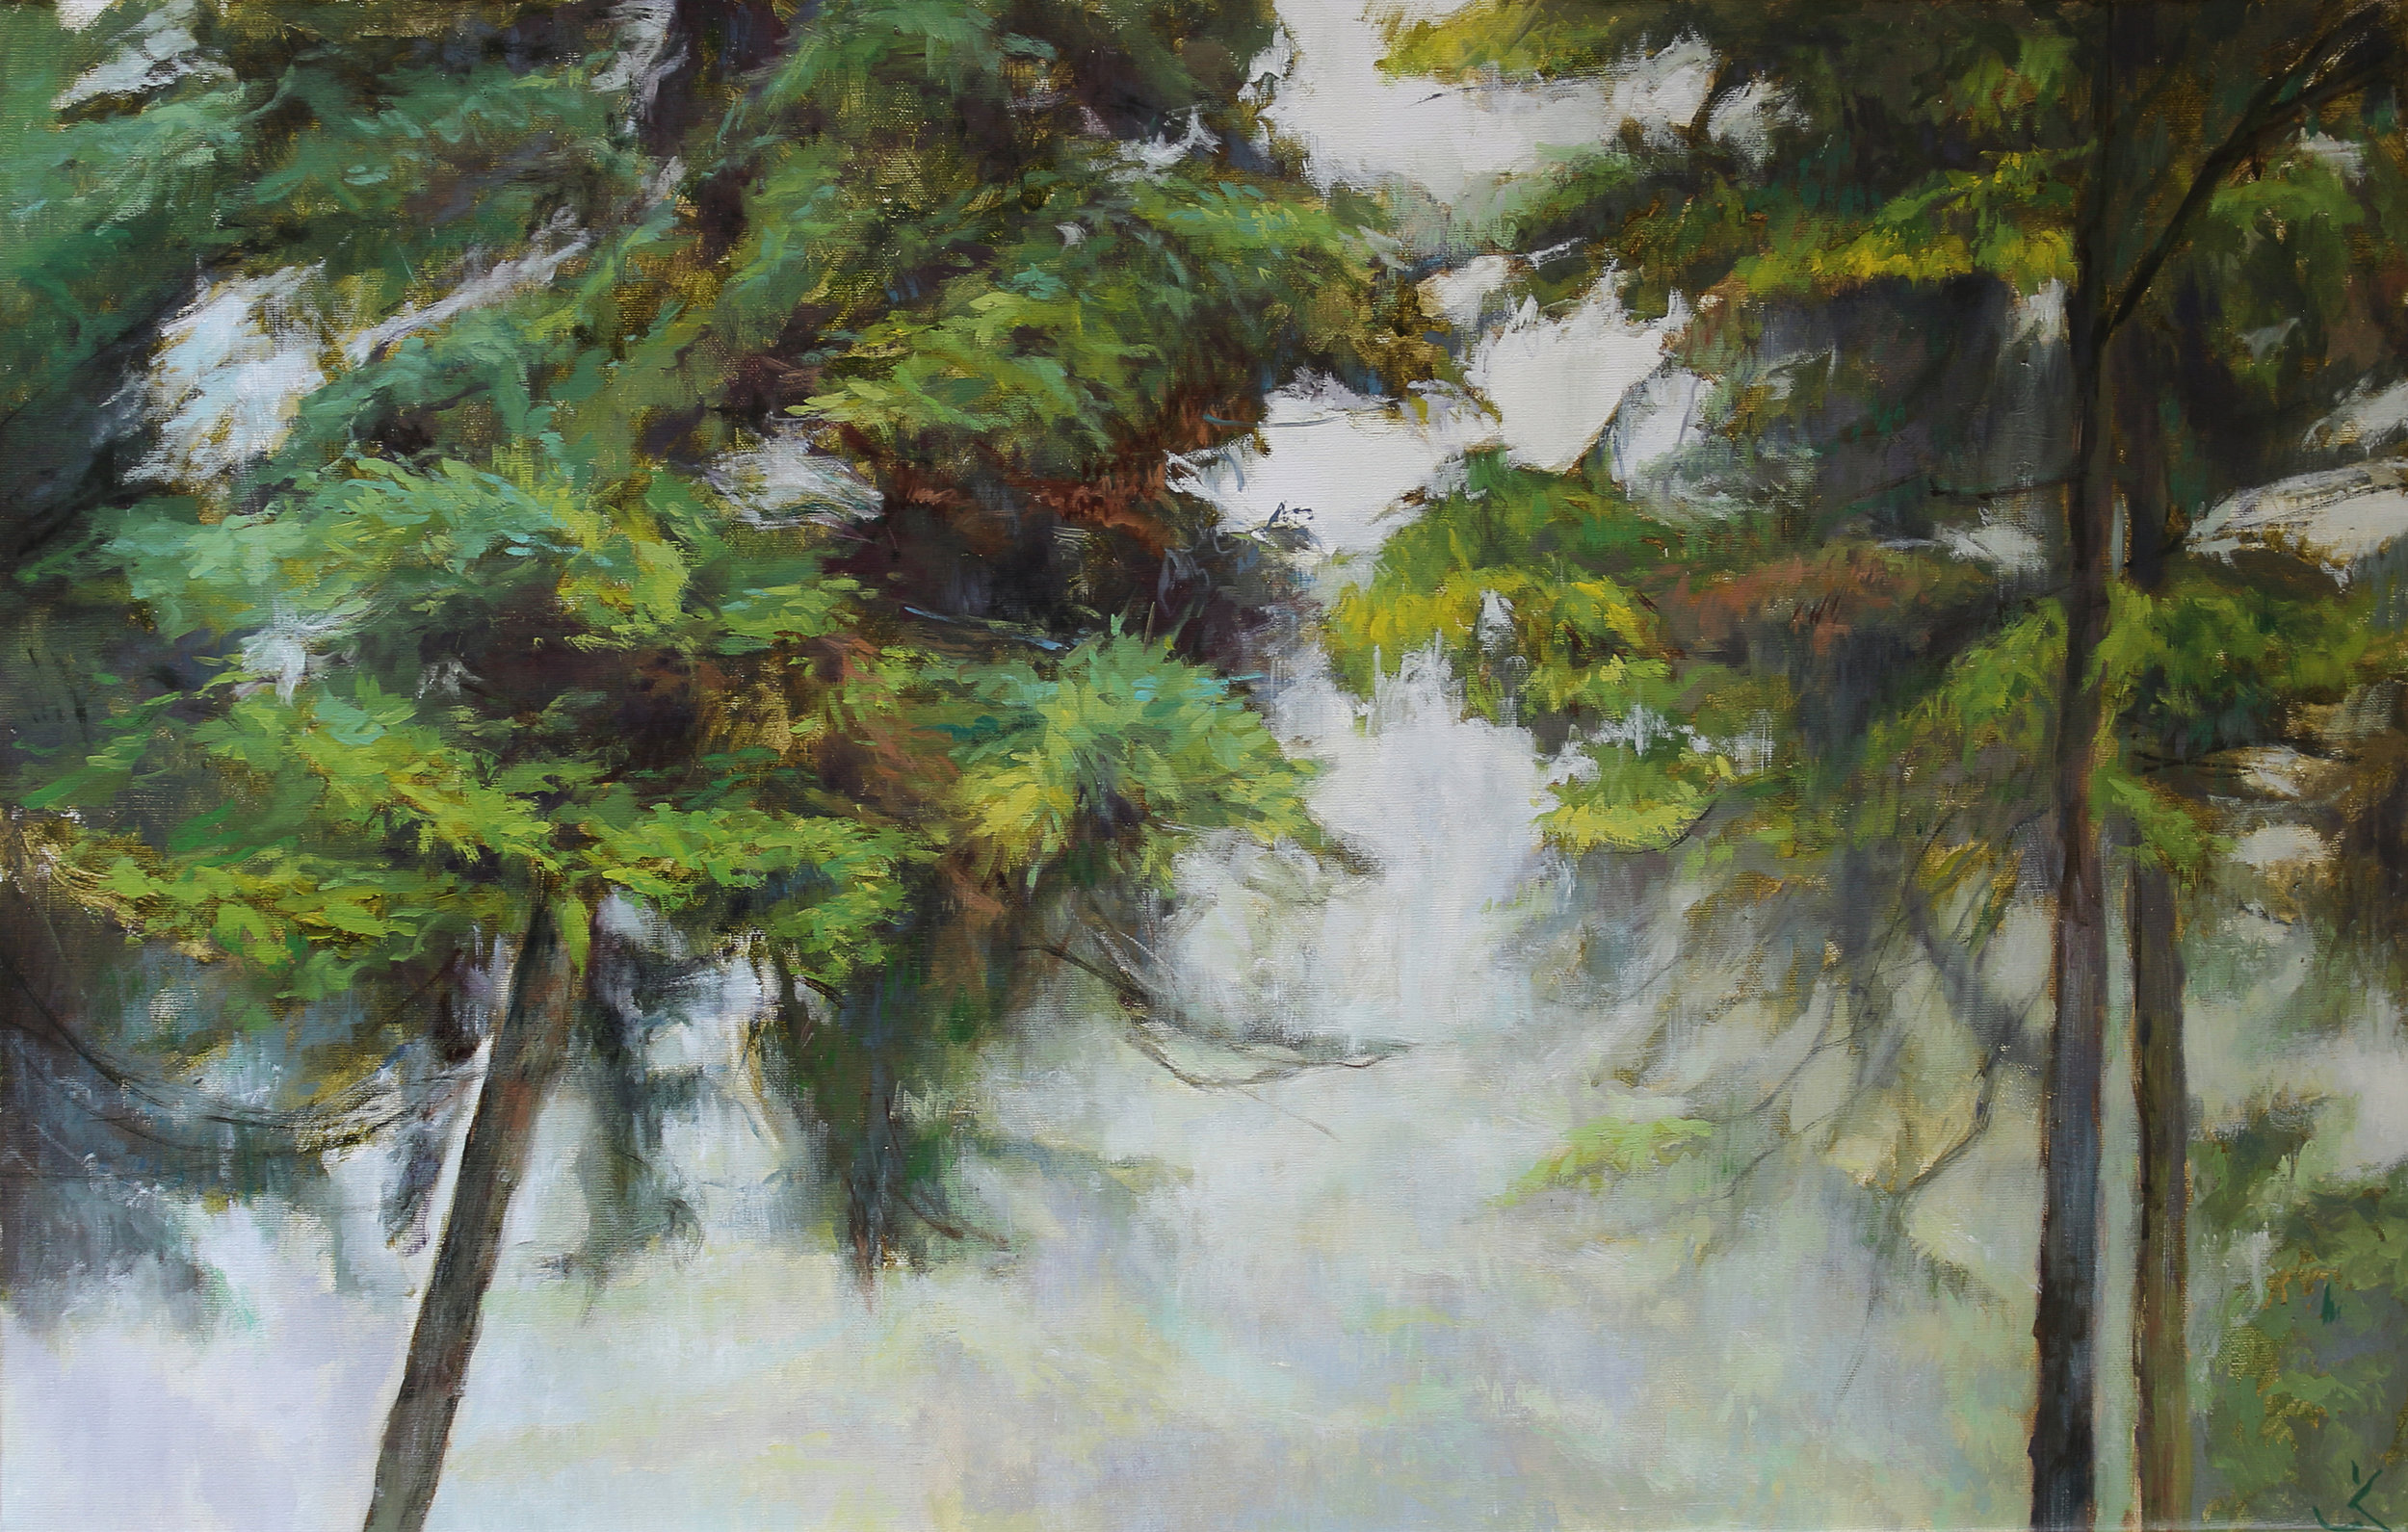 "Foggy day, 19.6"" x 31.4"" (50 x 80 cm), oil on canvas"